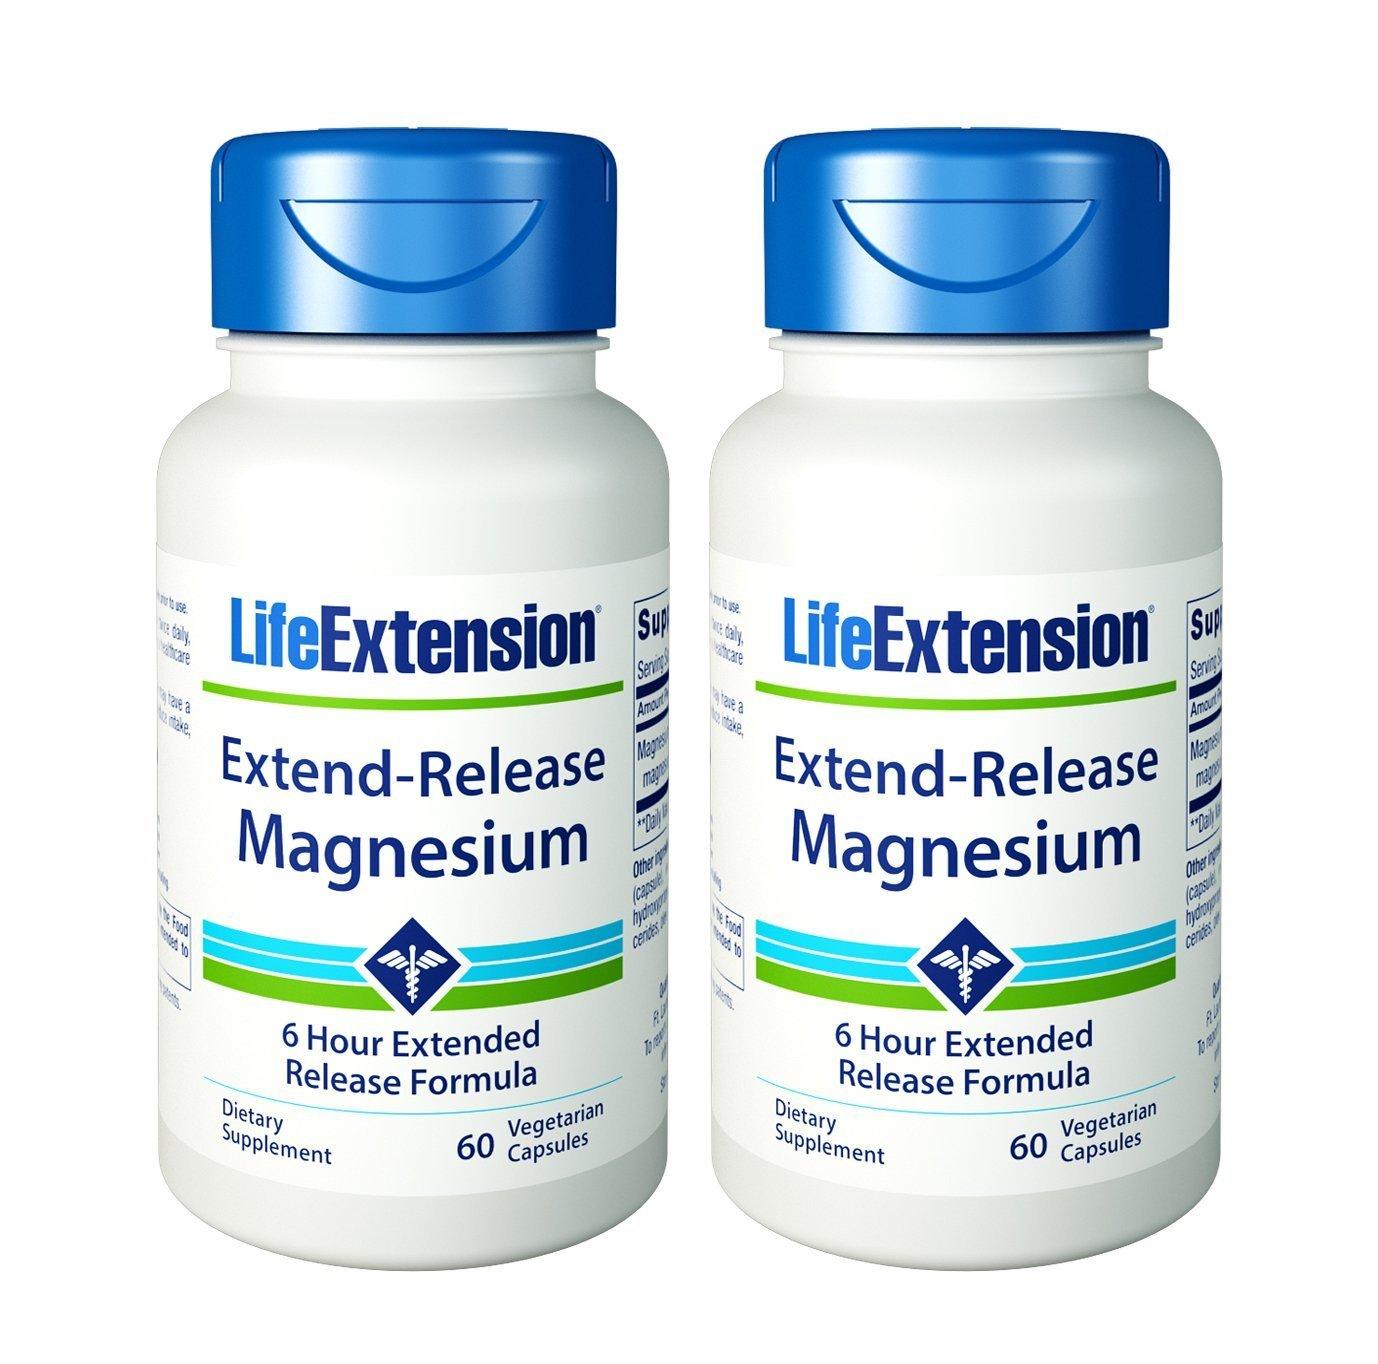 Life Extension ExtendRelease Magnesium Vegetarian